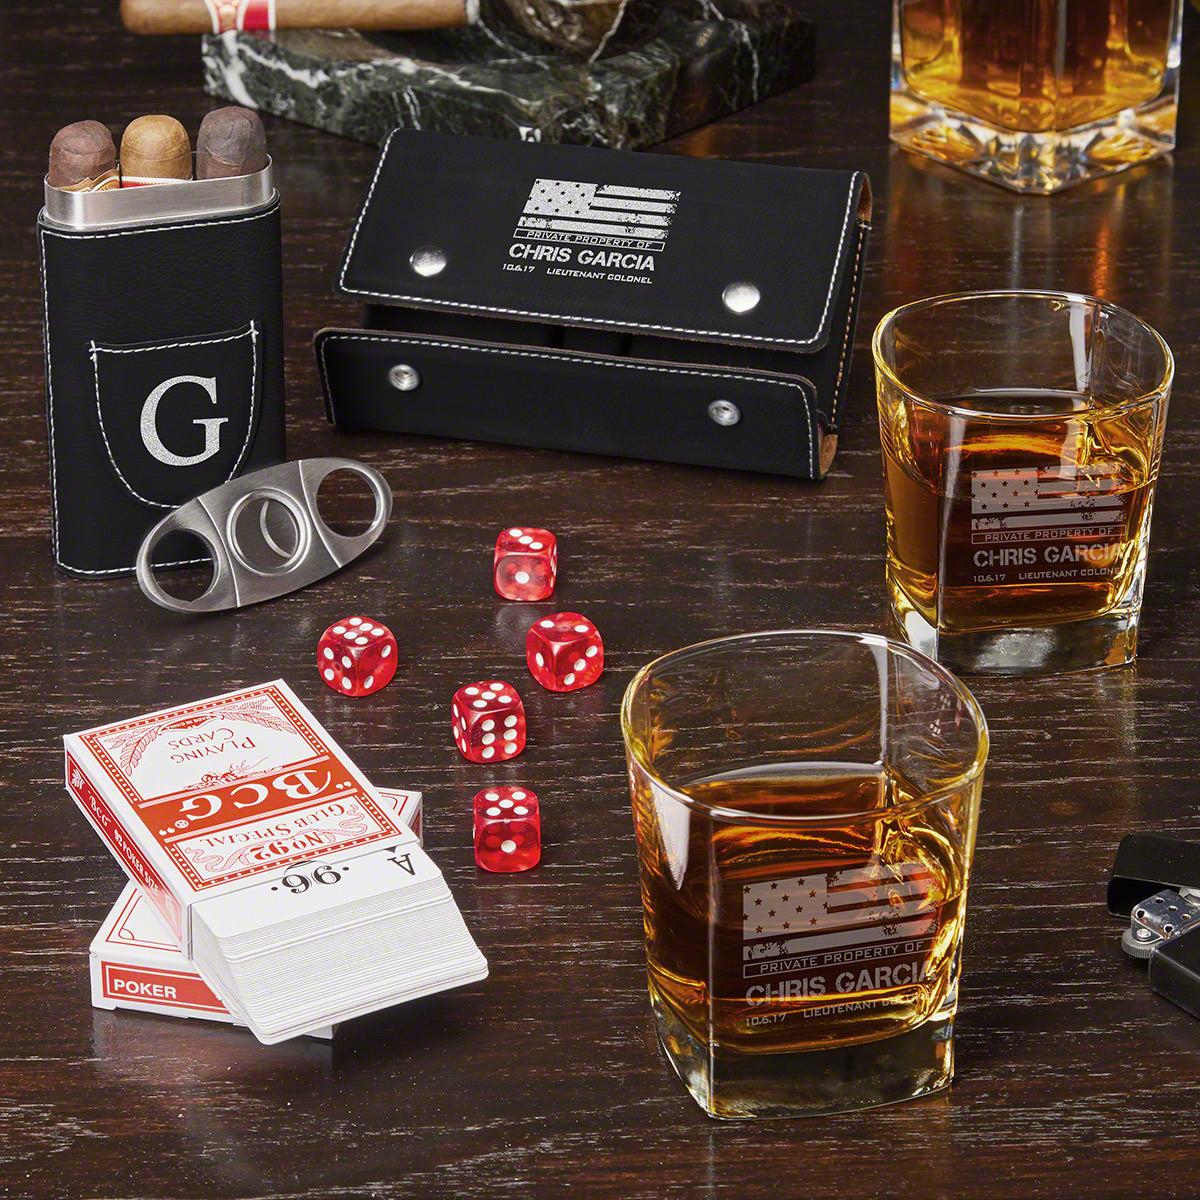 Game Night American Heroes Custom Whiskey Glasses & Black Cigar Set – Military Gift